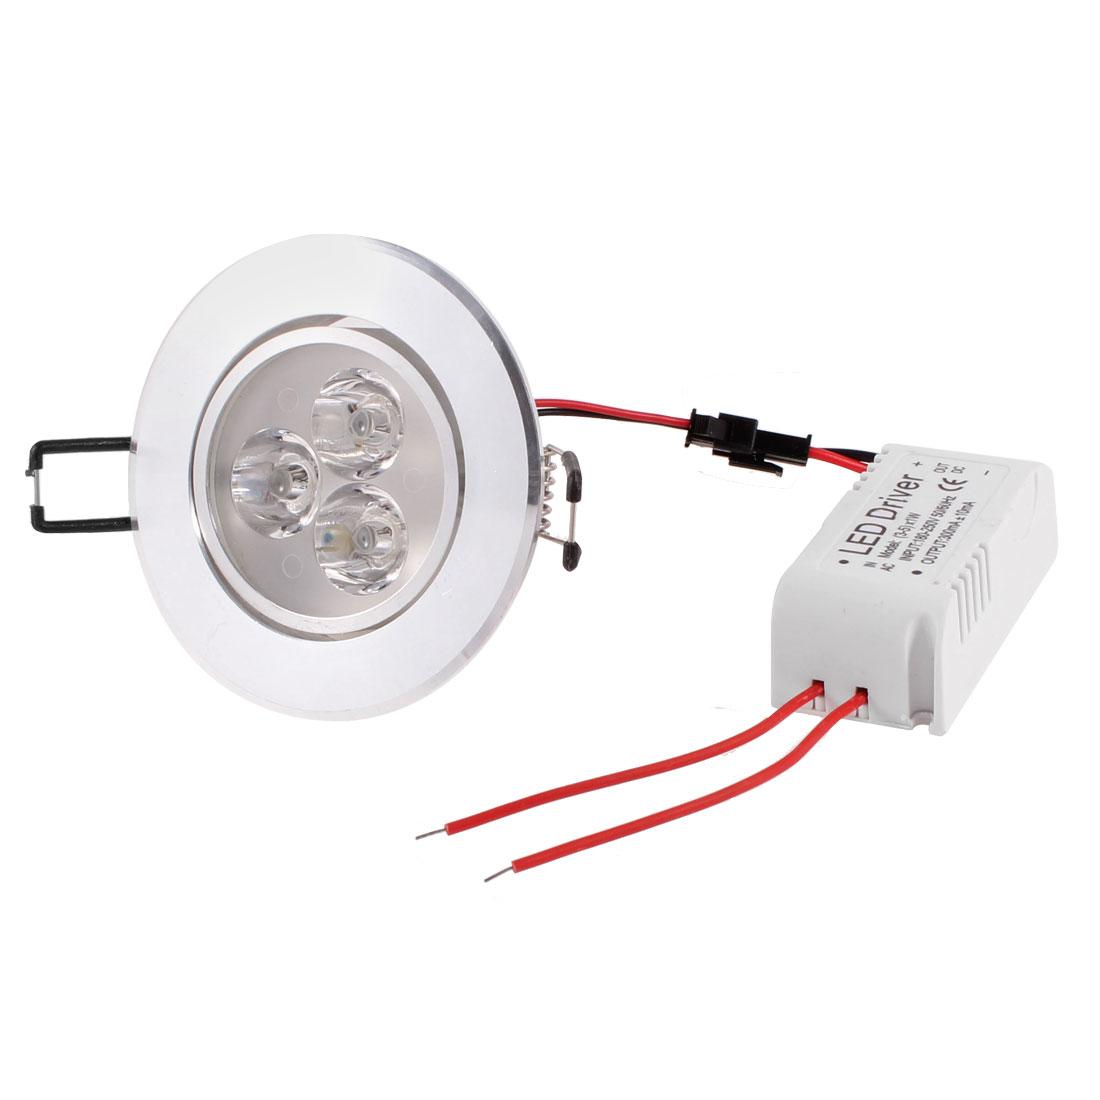 Indoor Warm White 3 LEDs Light Recessed Ceiling Down Lamp Bulb 180V-250V 3W